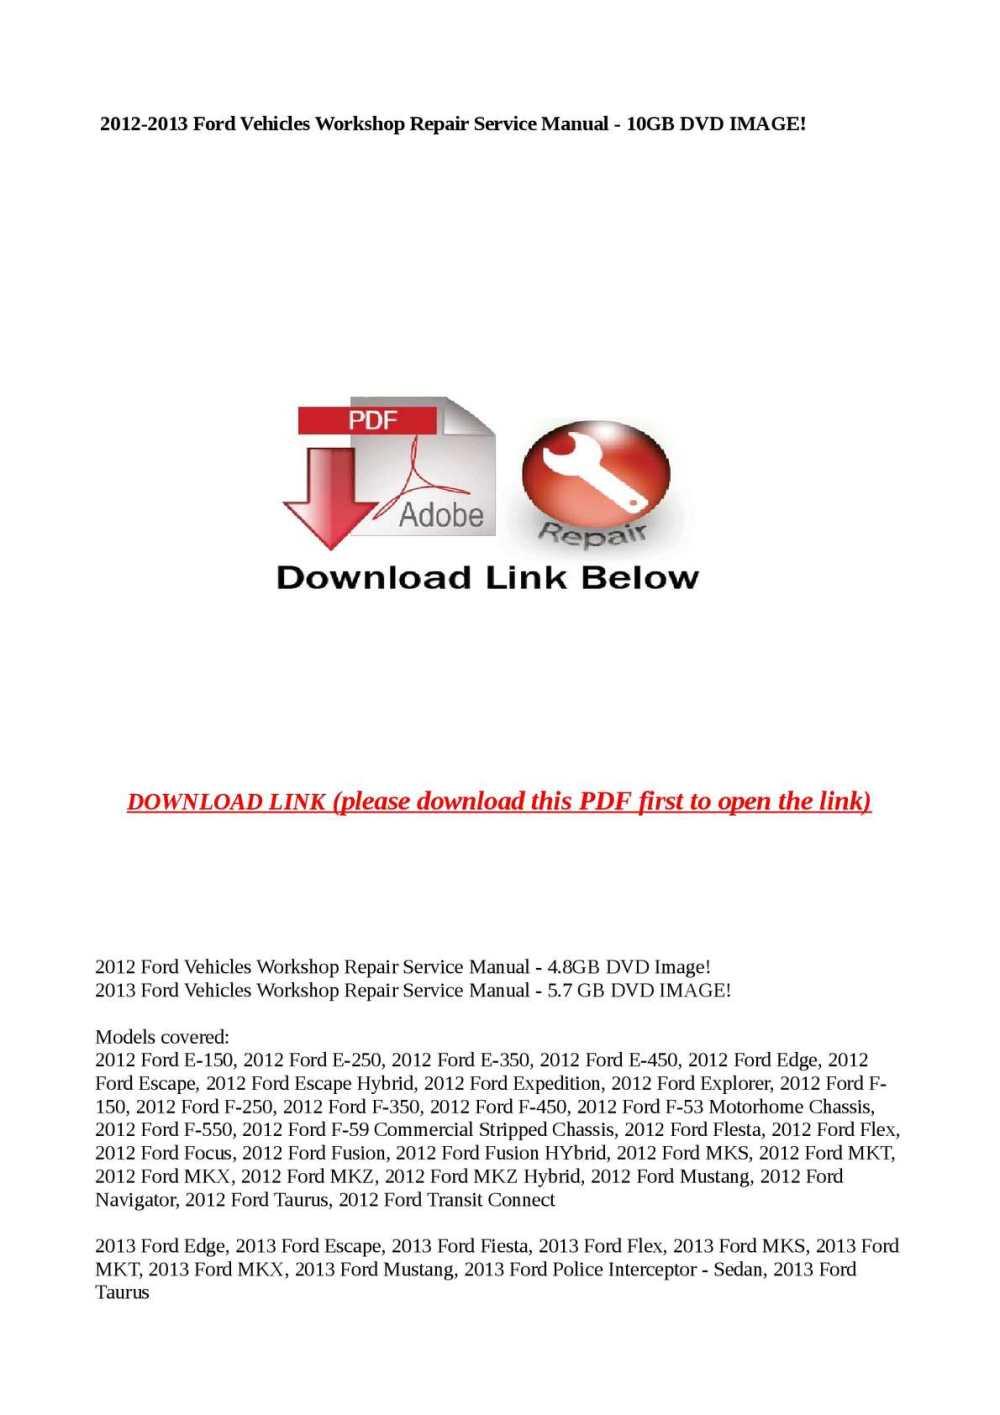 medium resolution of 2012 2013 ford vehicles workshop repair service manual 10gb dvd image